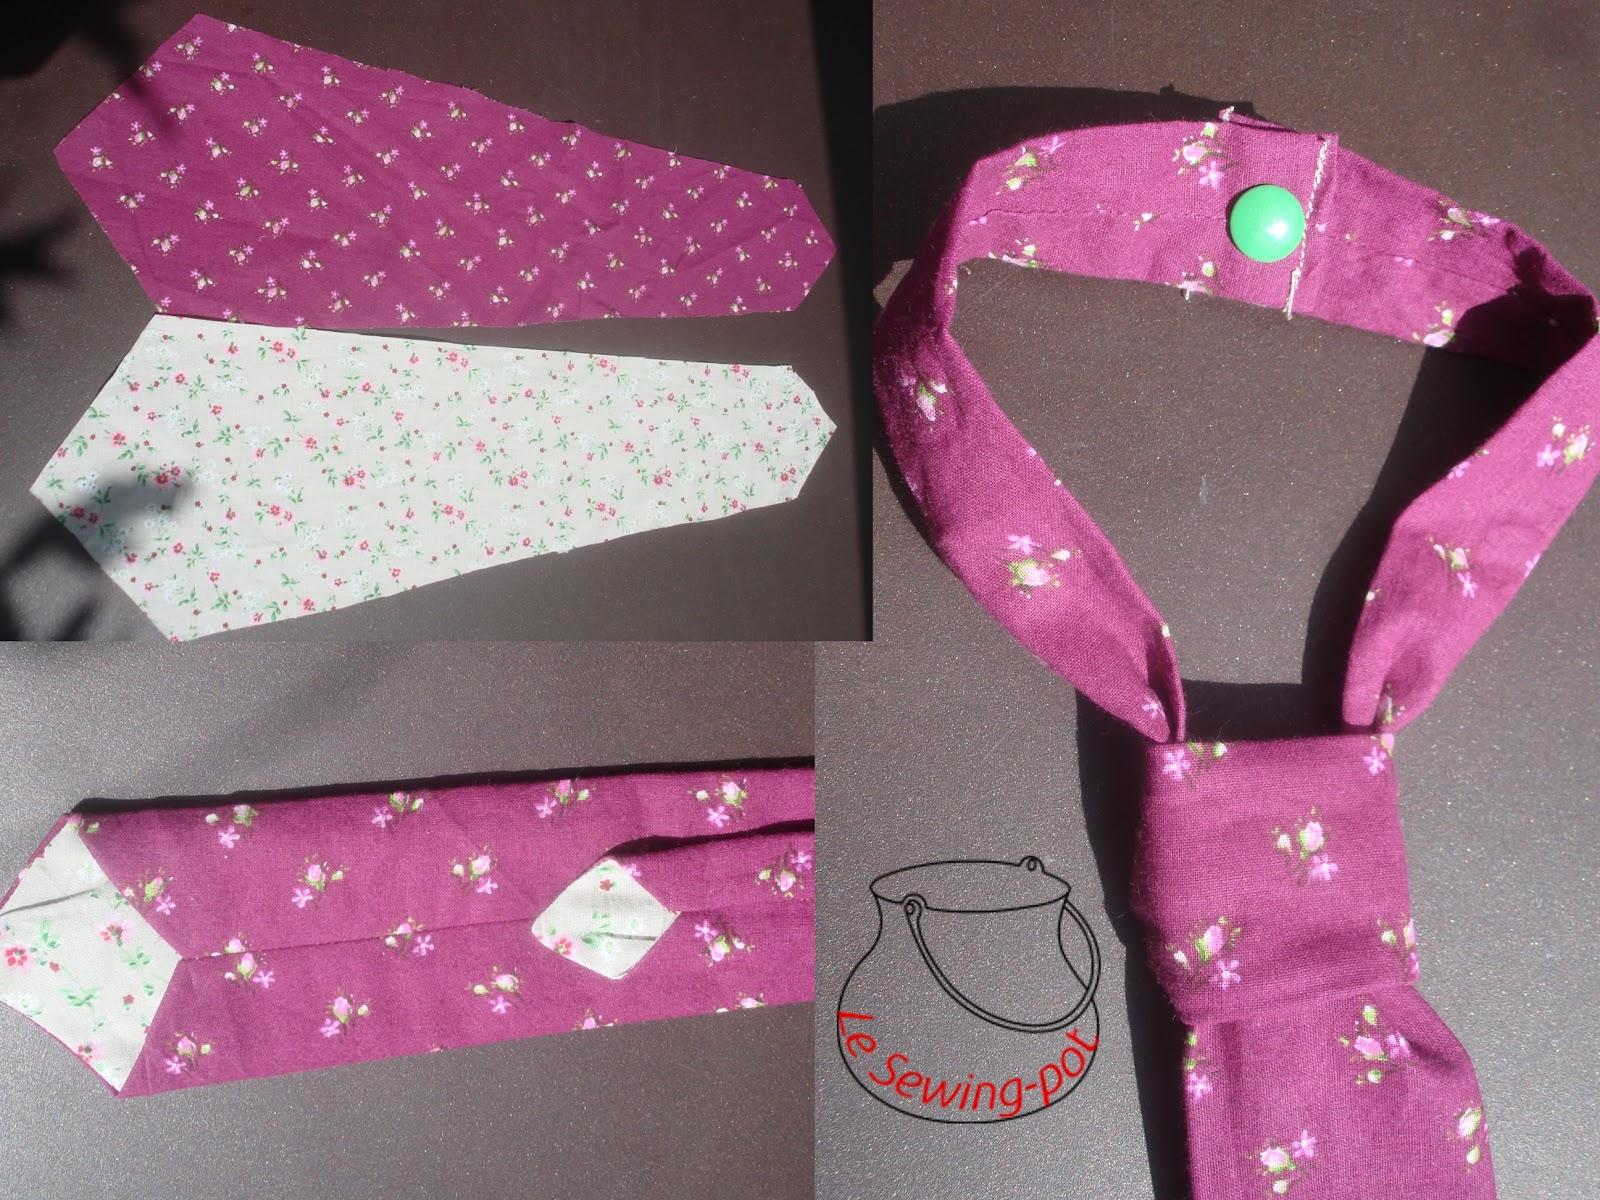 le sewing pot cravate enfant child 39 s tie. Black Bedroom Furniture Sets. Home Design Ideas